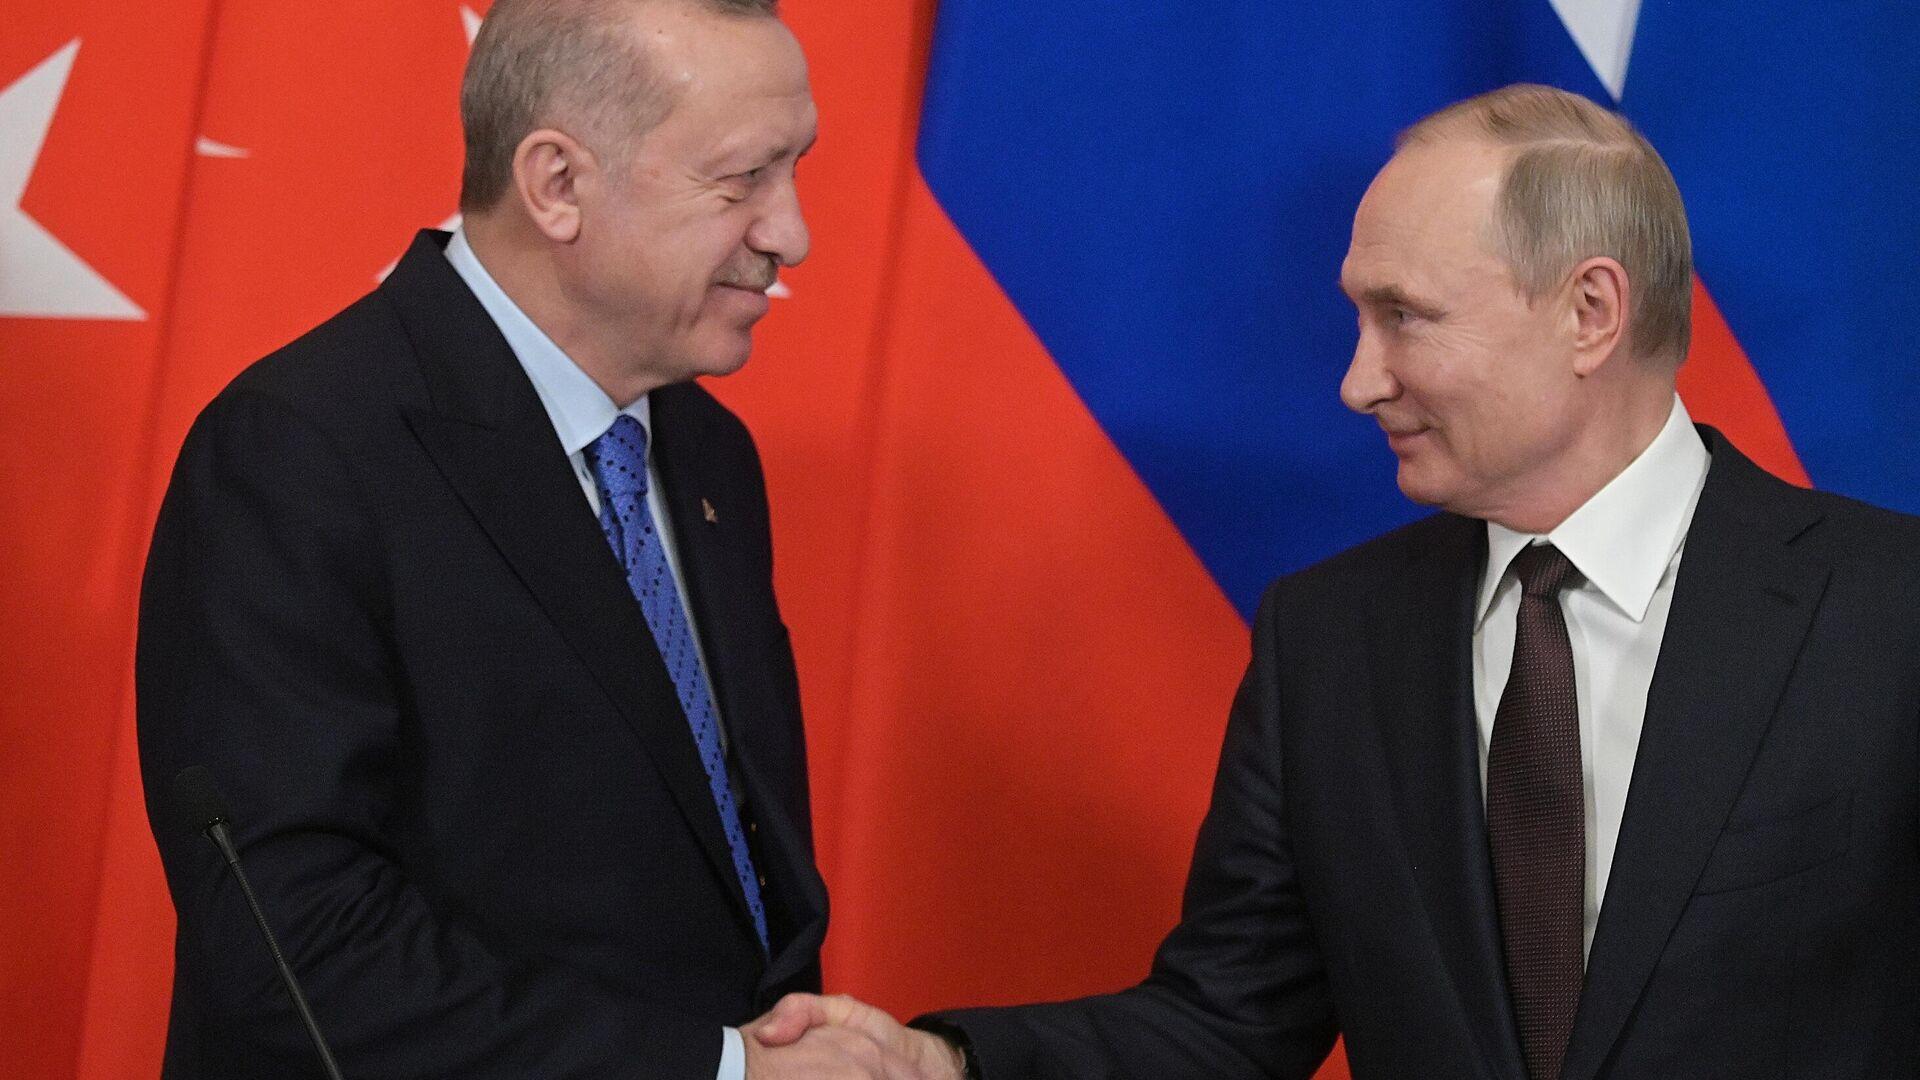 Президент РФ Владимир Путин и президент Турции Реджеп Тайип Эрдоган - РИА Новости, 1920, 24.11.2020